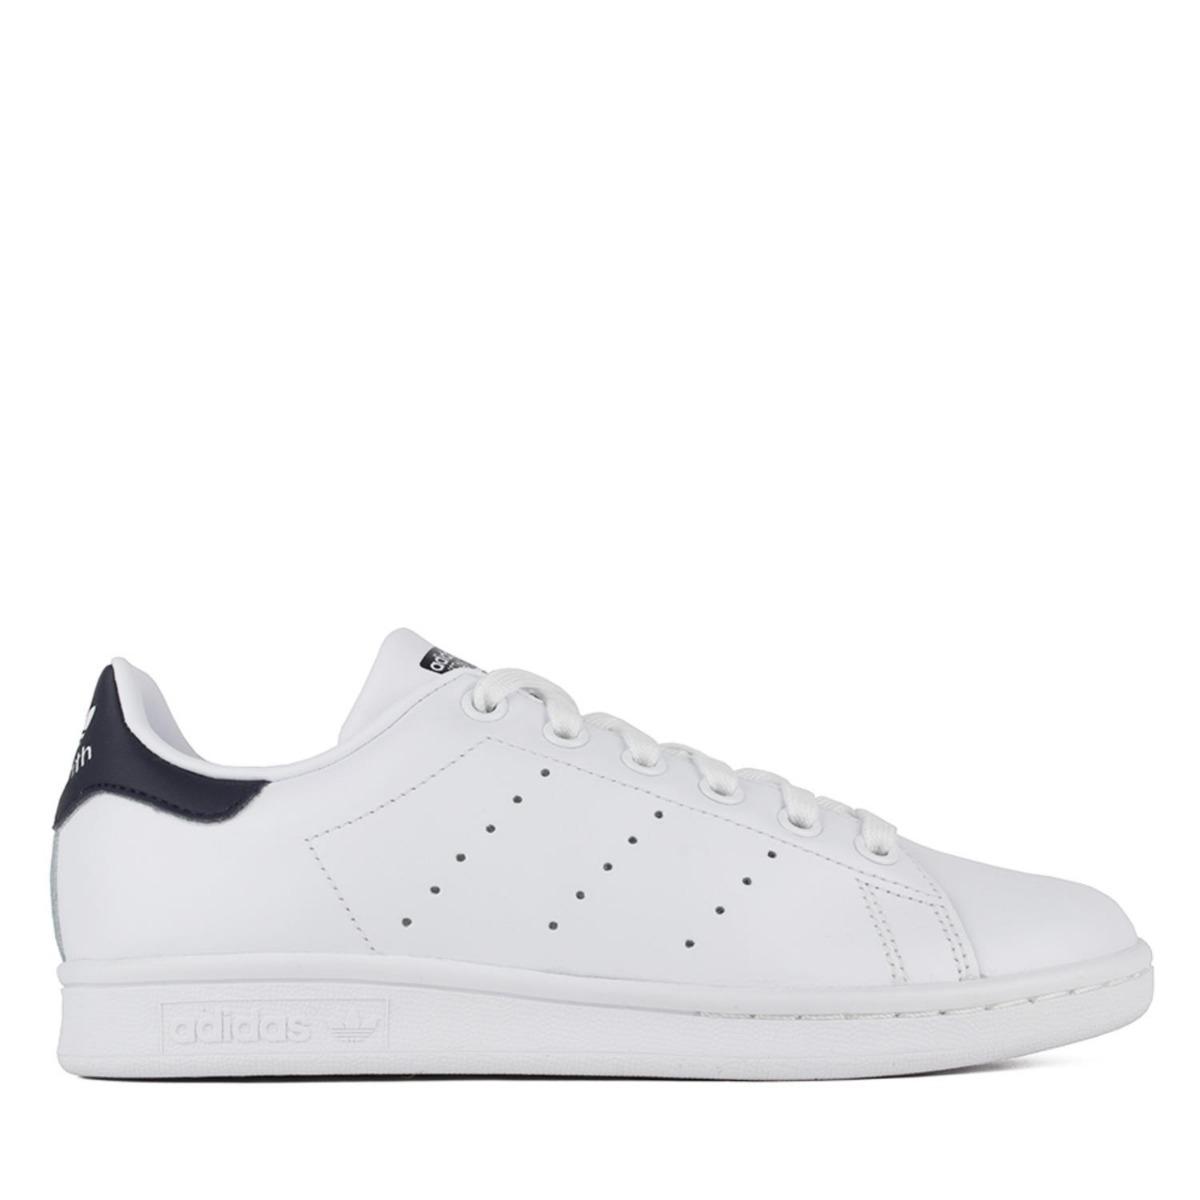 low priced 0e055 f8a81 tenis adidas stan smith m20325 hombre. Cargando zoom.